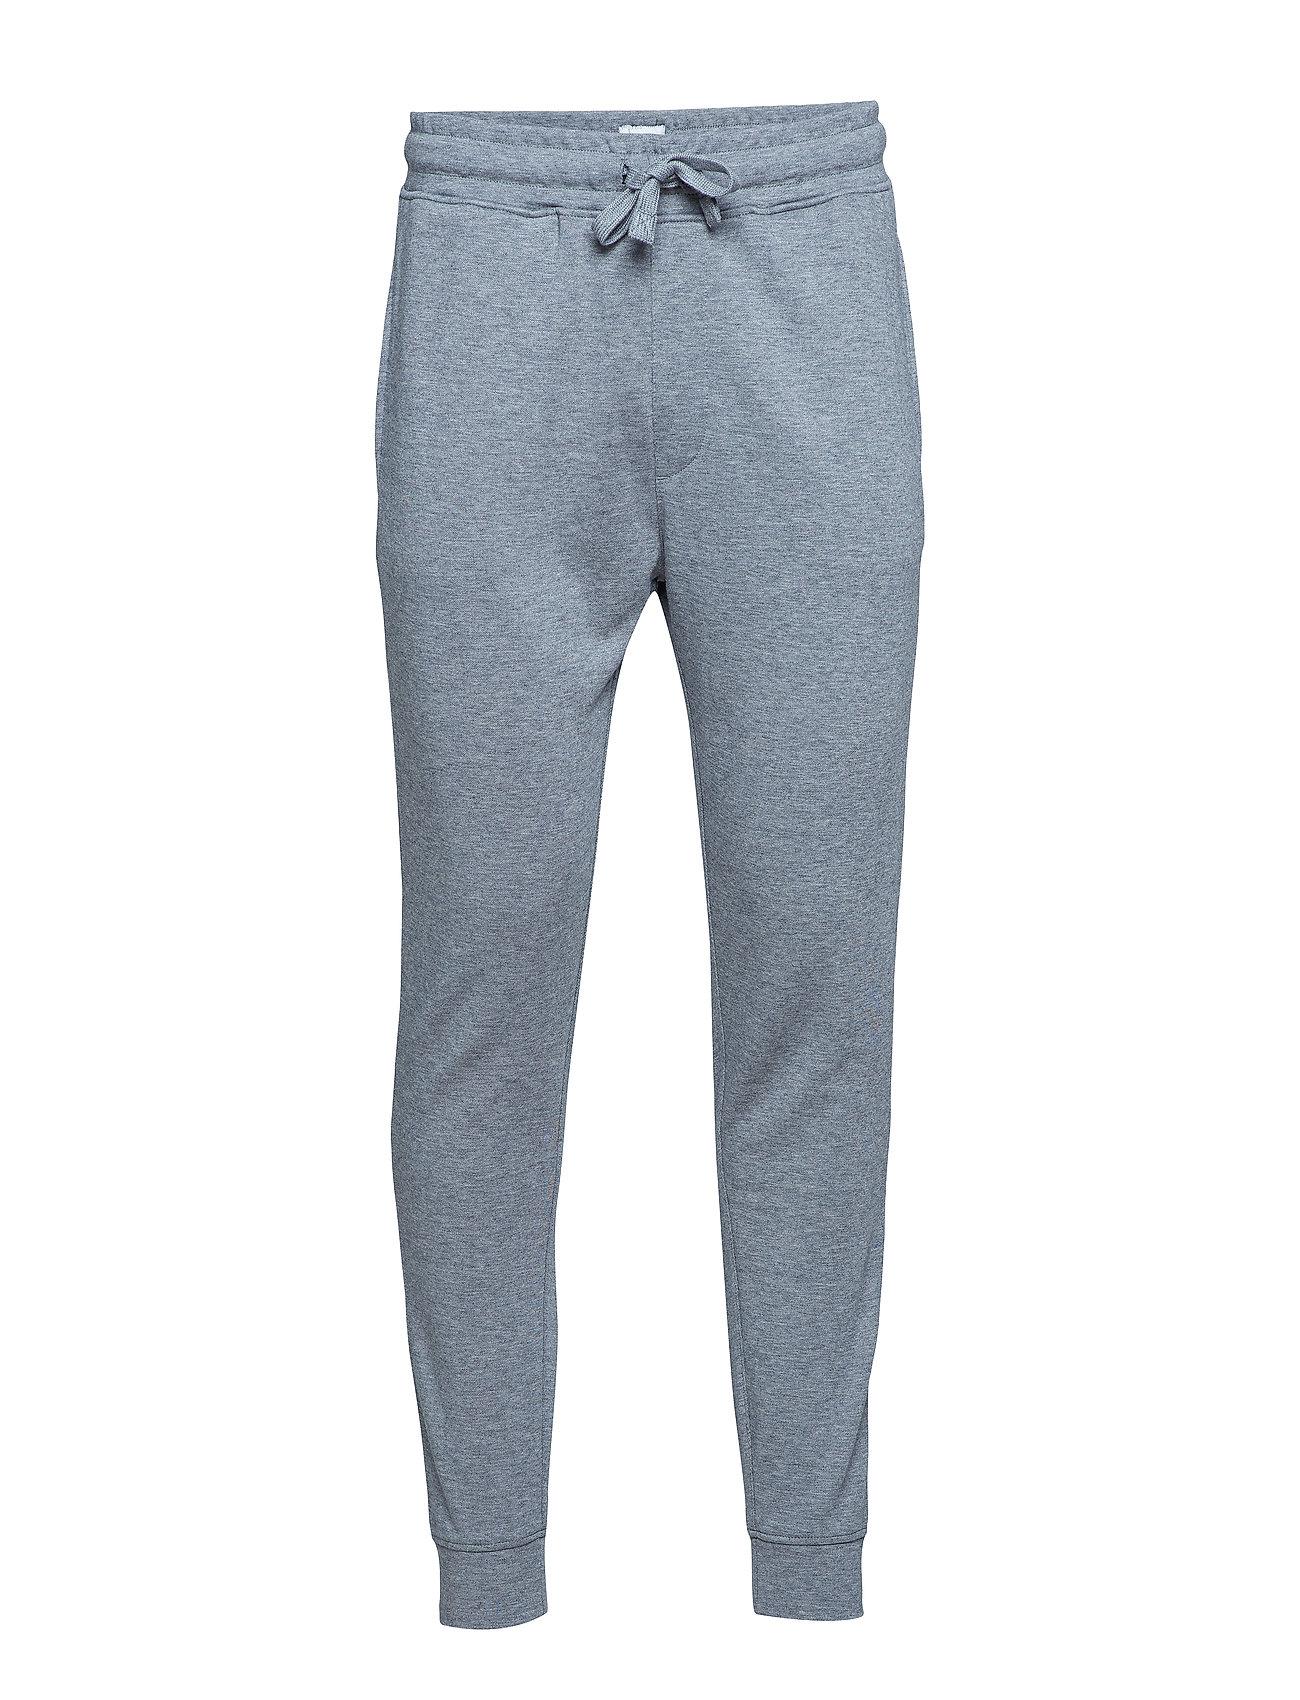 JBS of Denmark JBS of Denmark, bamboo pants - DARK GREY